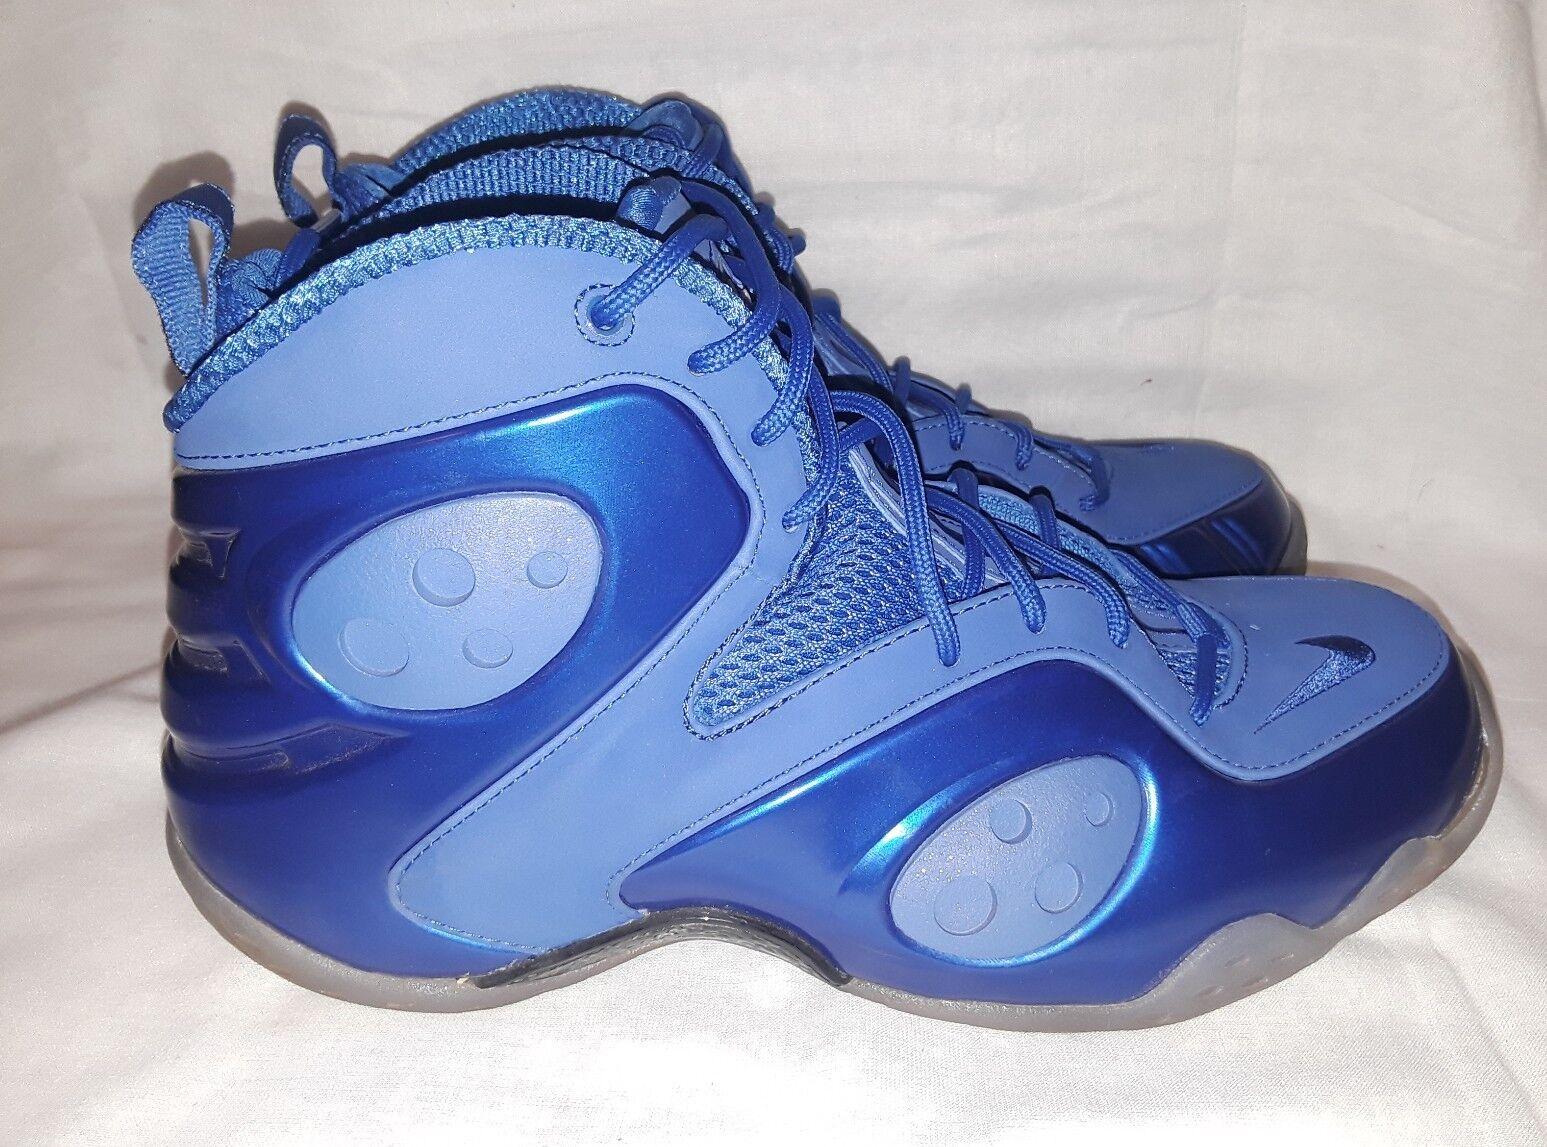 Nike Zoom Rookie LWP Penny Foamposite Memphis bluee shoes 9